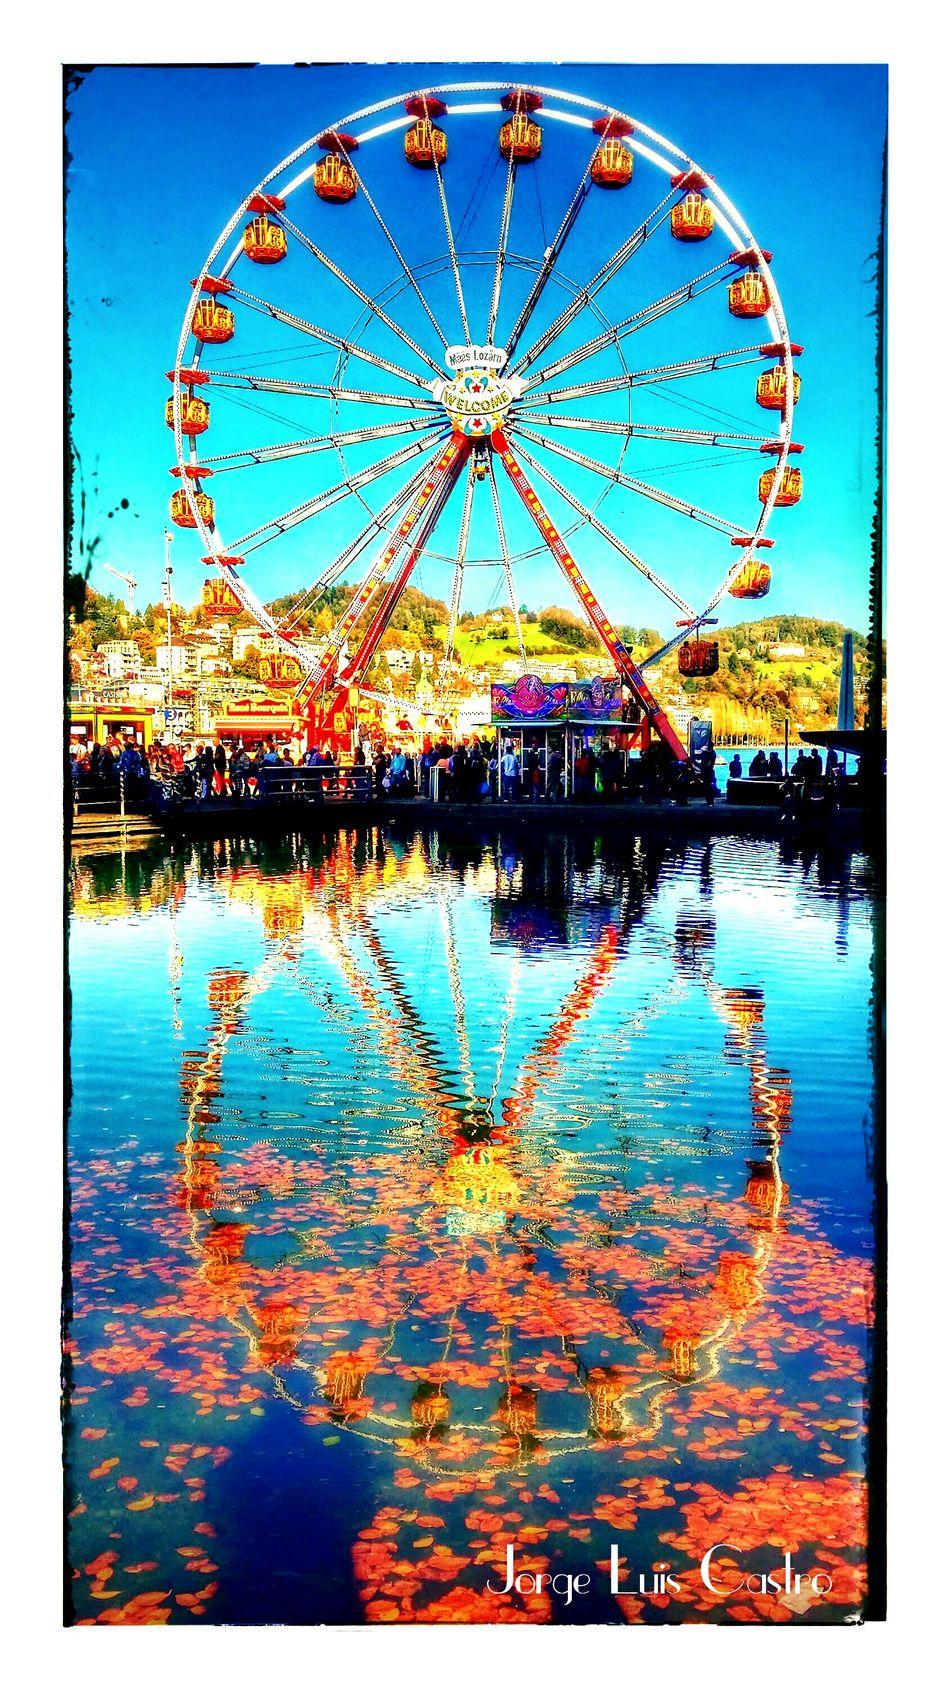 Wheel Of Life Feria Colors Enjoy Water Reflection Kkl Swiss Luzern Lake Luzerne